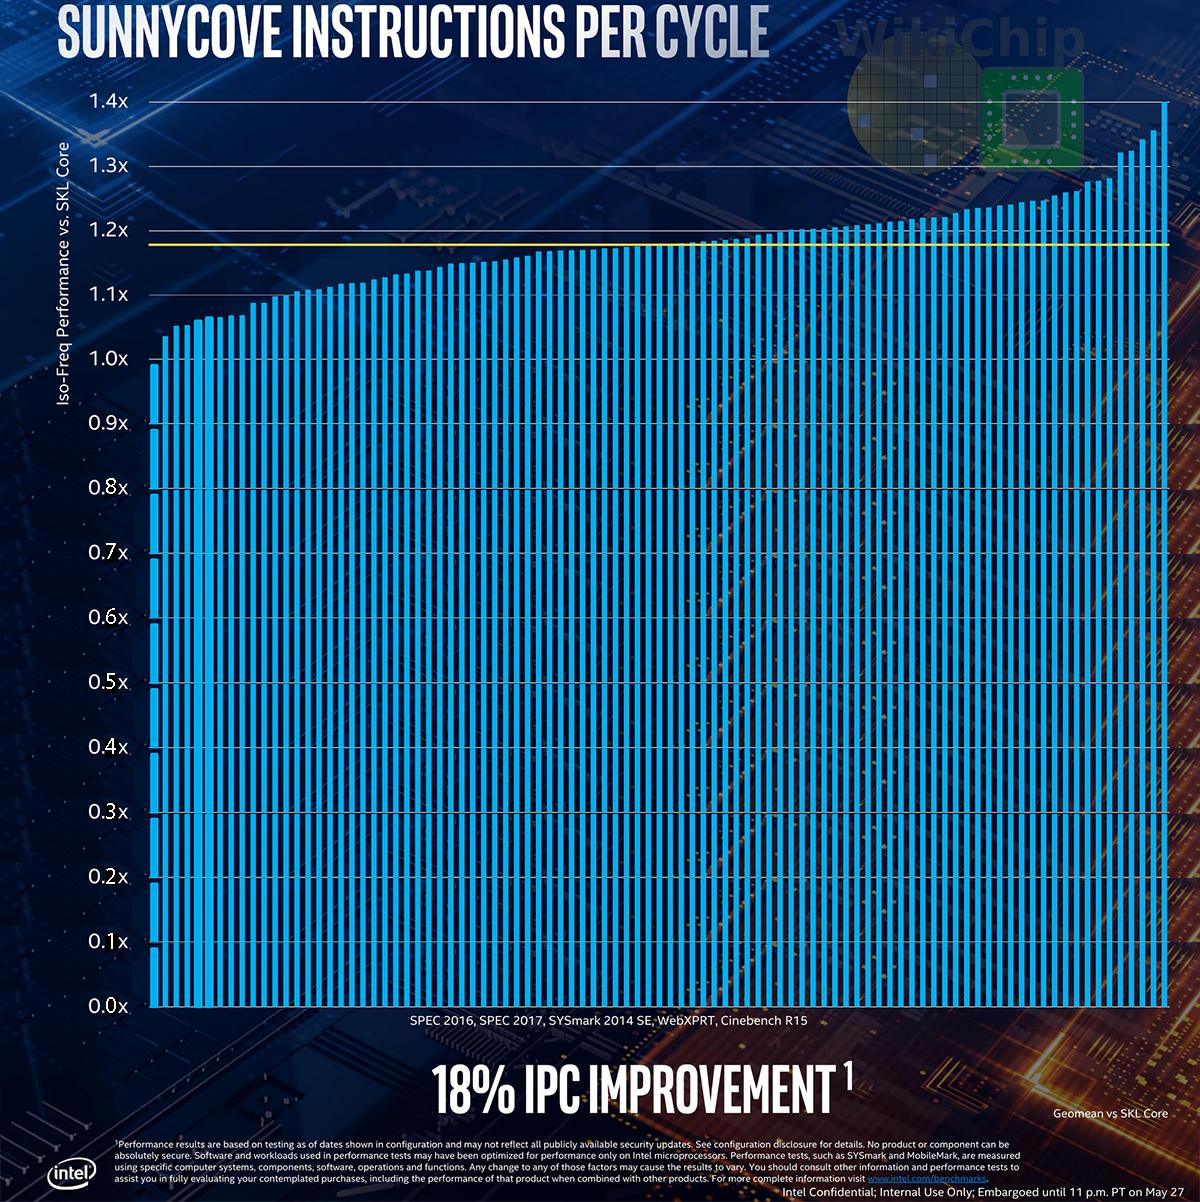 Intel Announces Sunny Cove Brings 18% IPC Improvement | Page